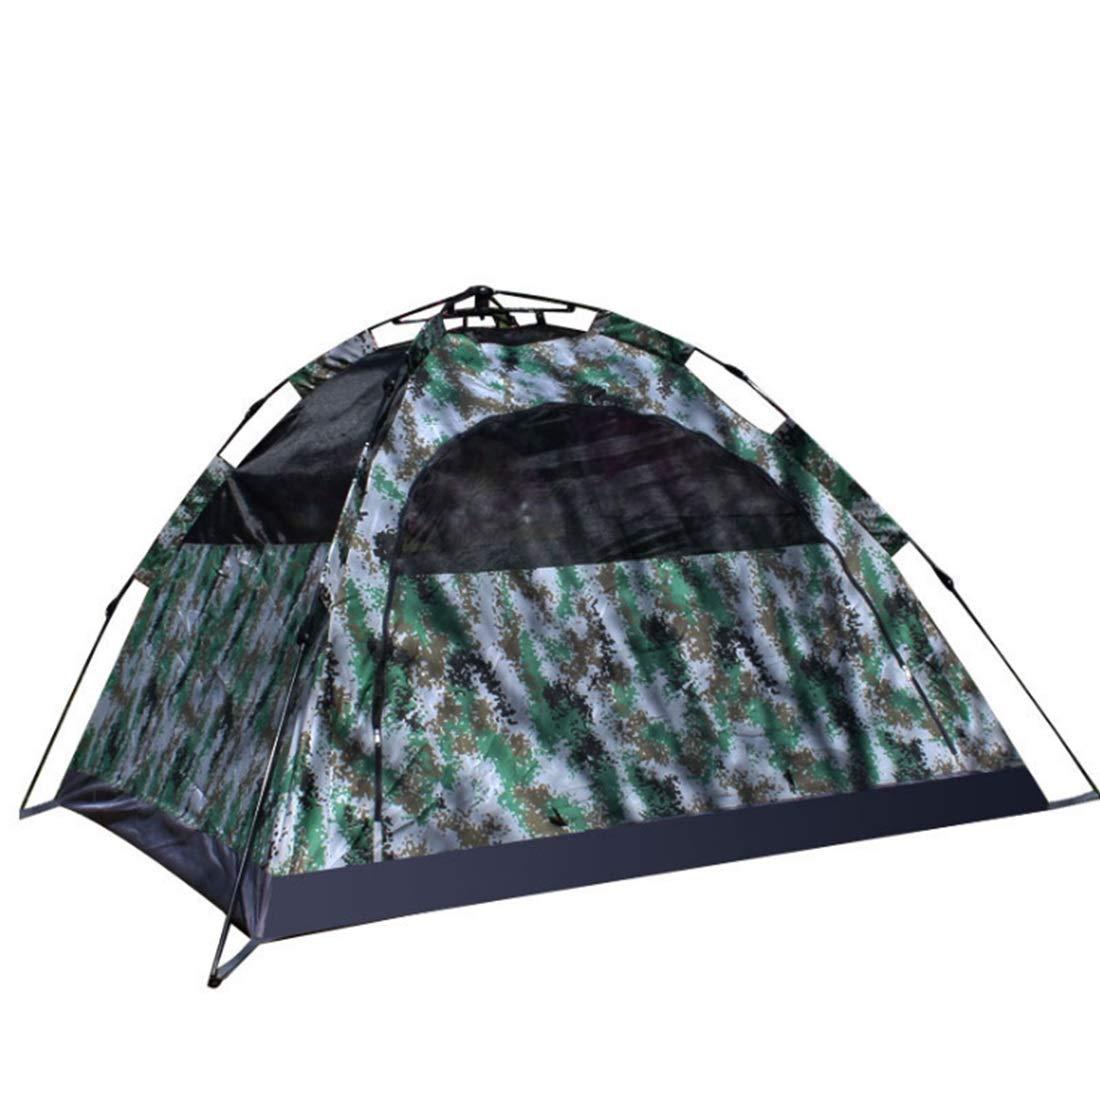 Ploekgda 3 Personen oder 4 Personen Camouflage Zelt Wild Activity Zelt (Farbe   Camouflage)